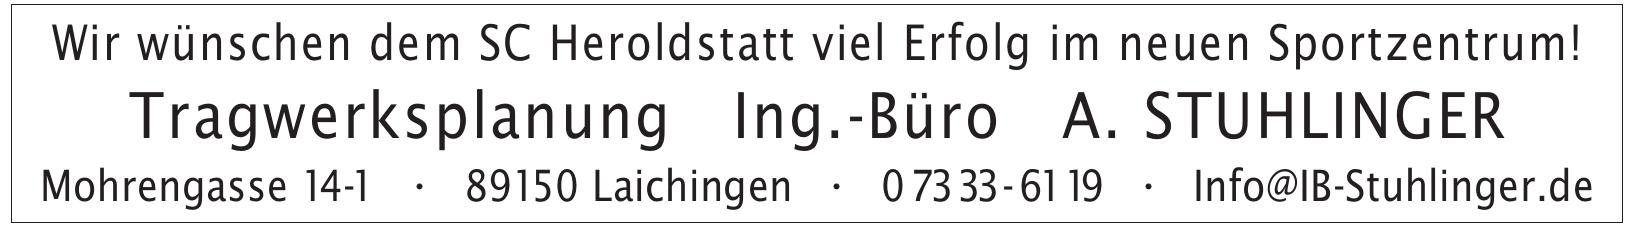 IB A. Stuhlinger